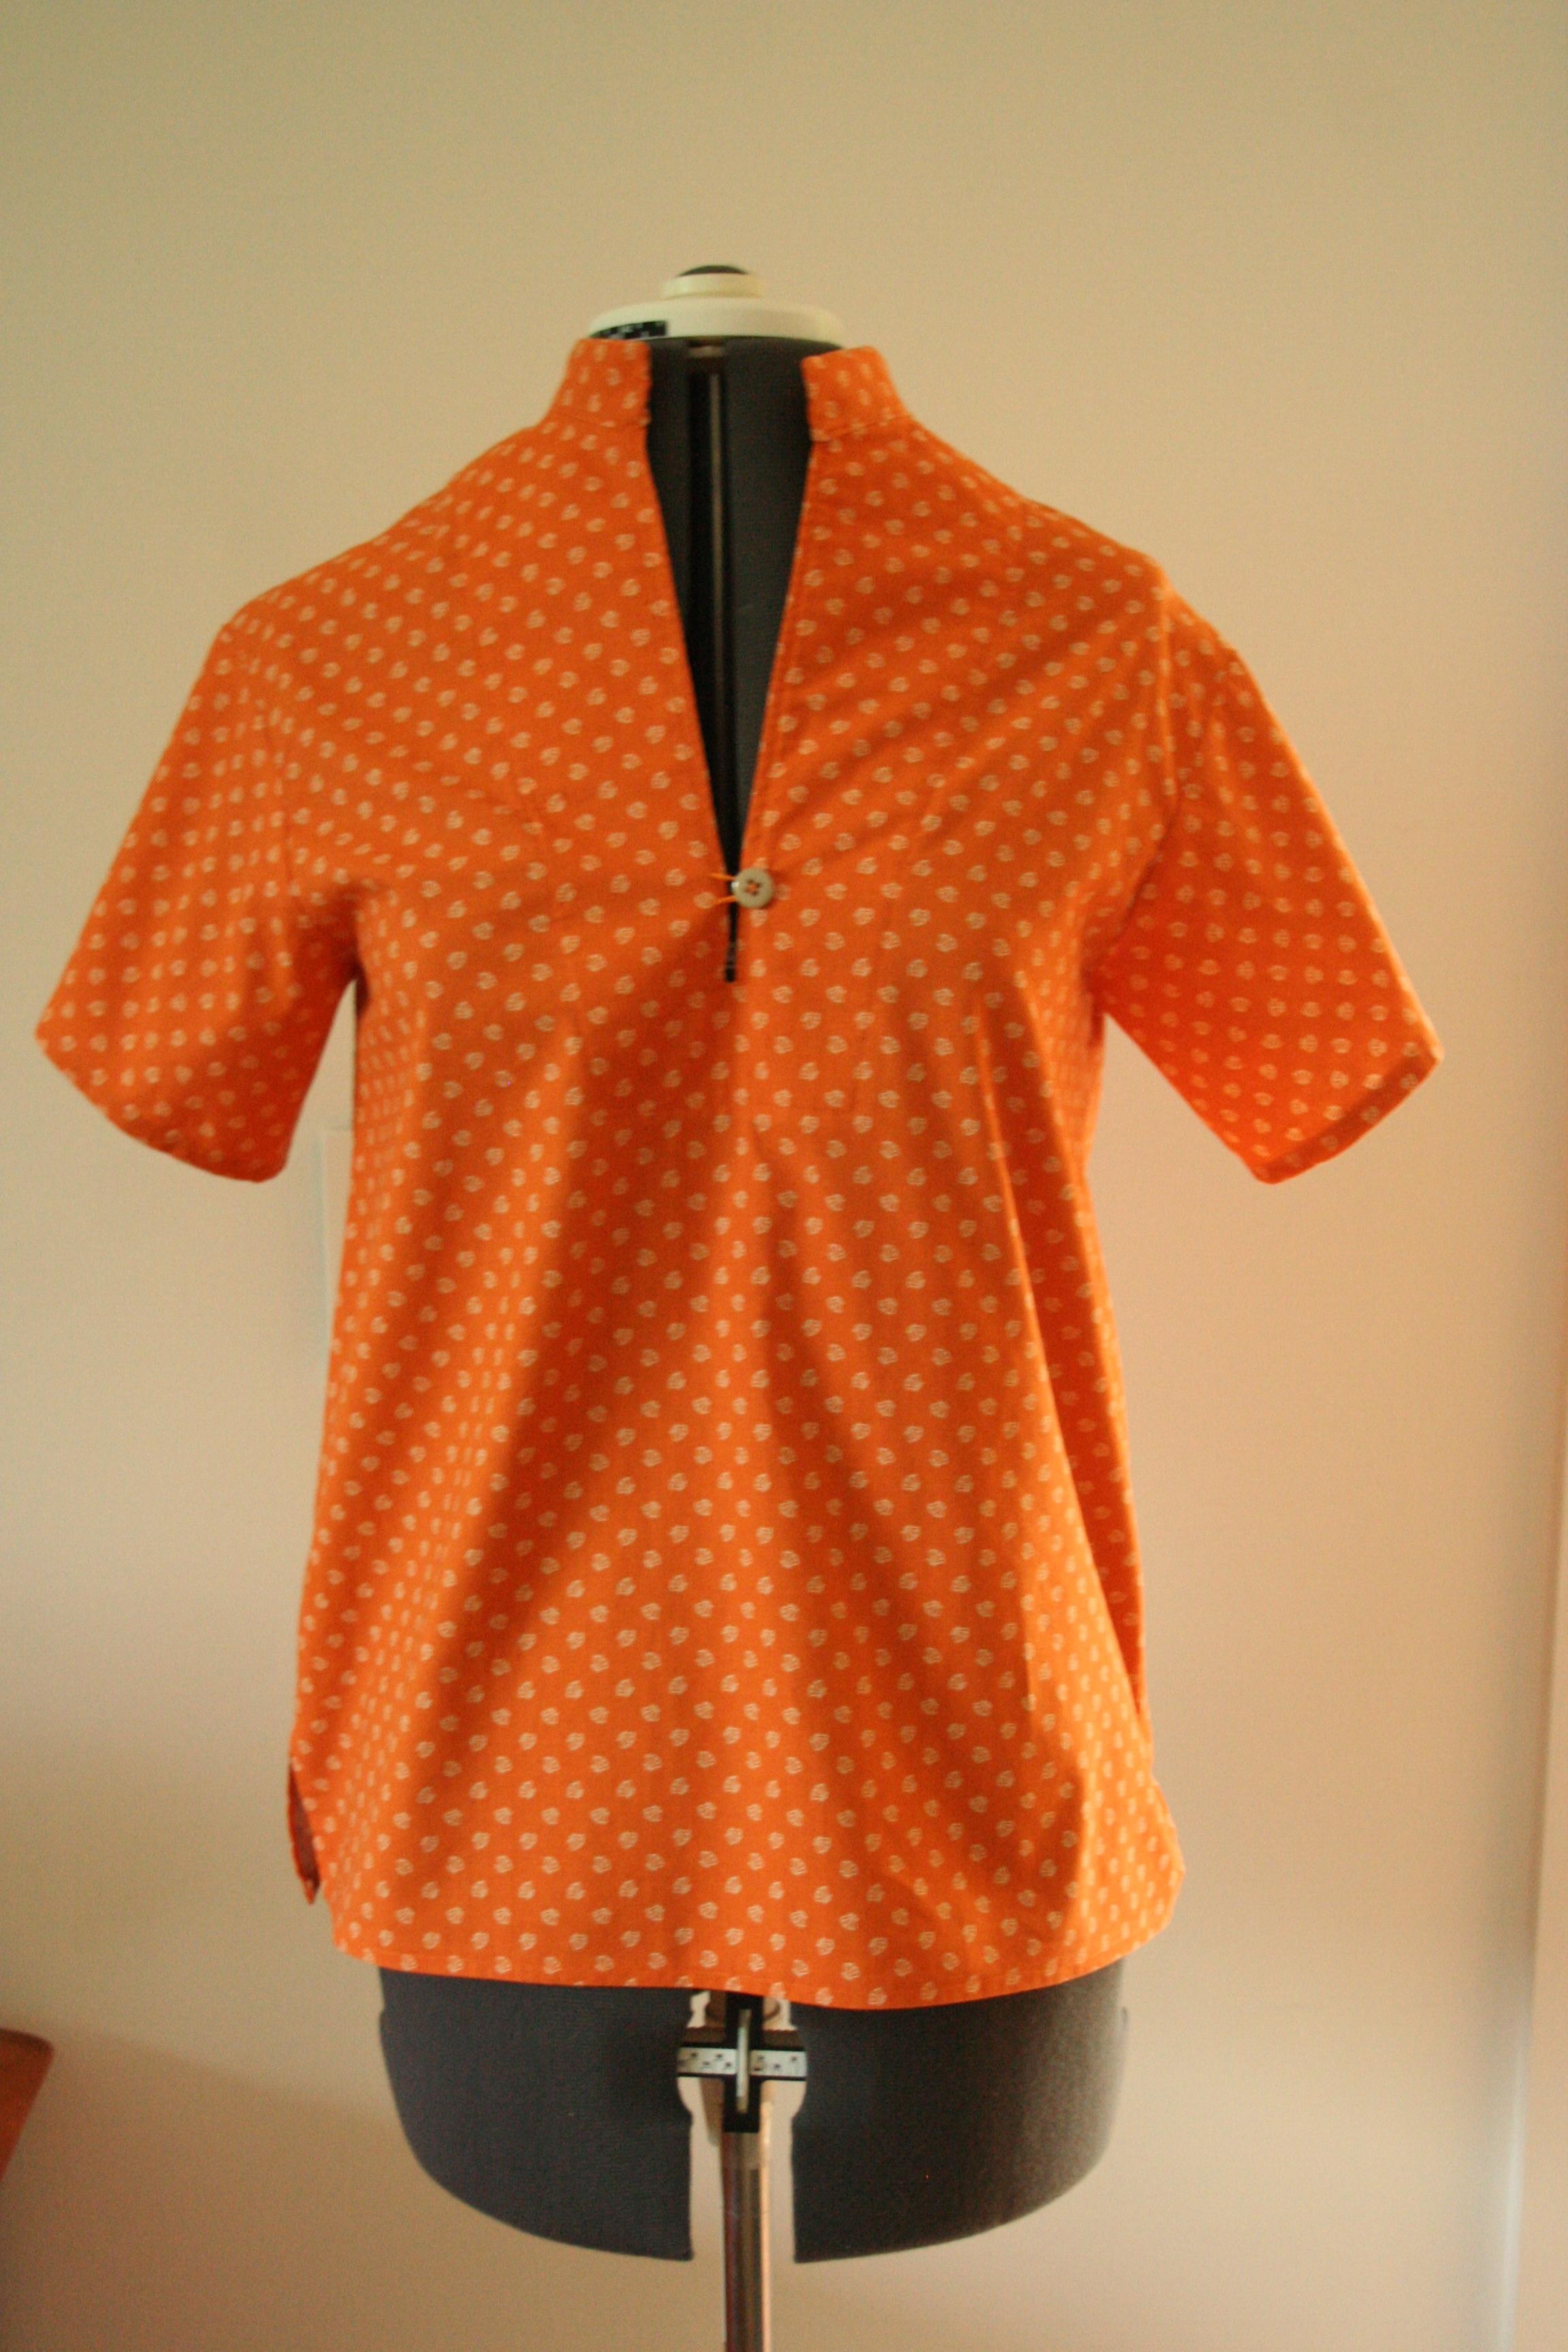 heidi pullover front on dressform